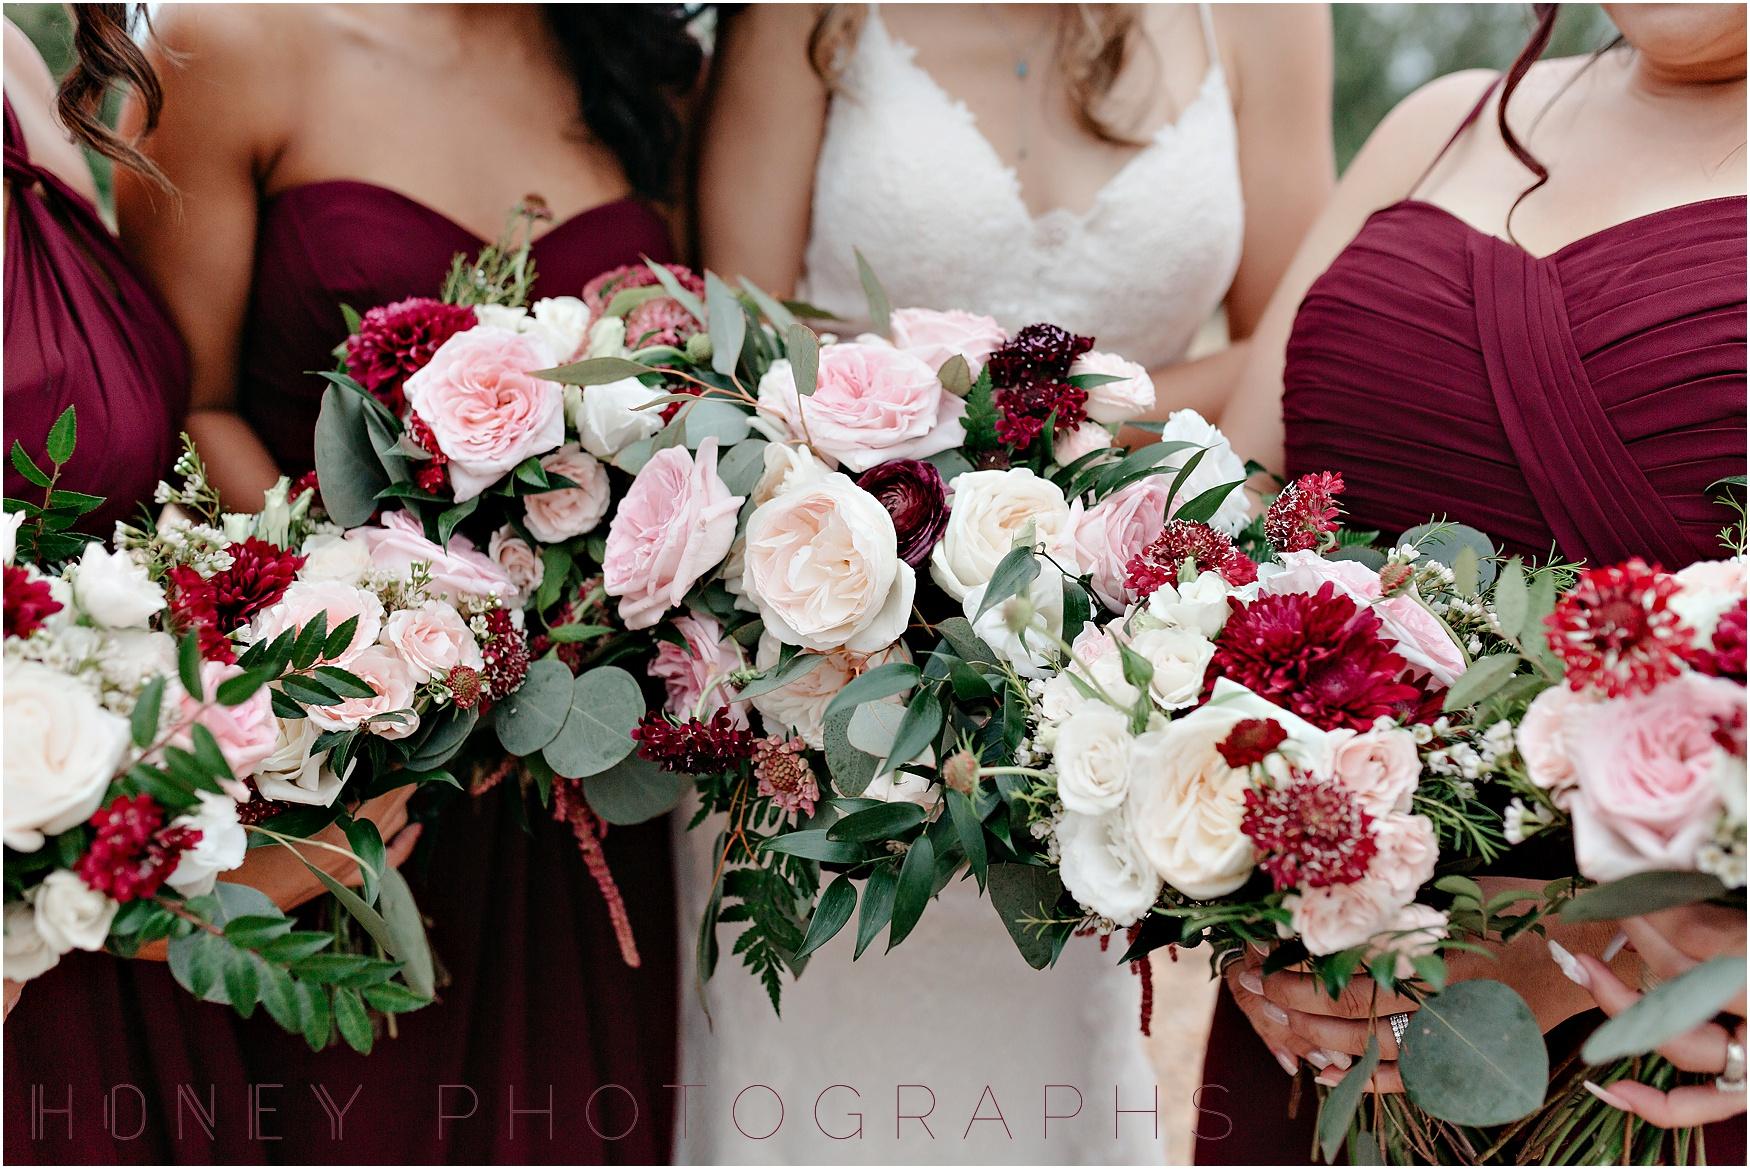 garden-classic-burgundy-jewel-tone-luxury-pacific-event-oceanside-wedding38.jpg